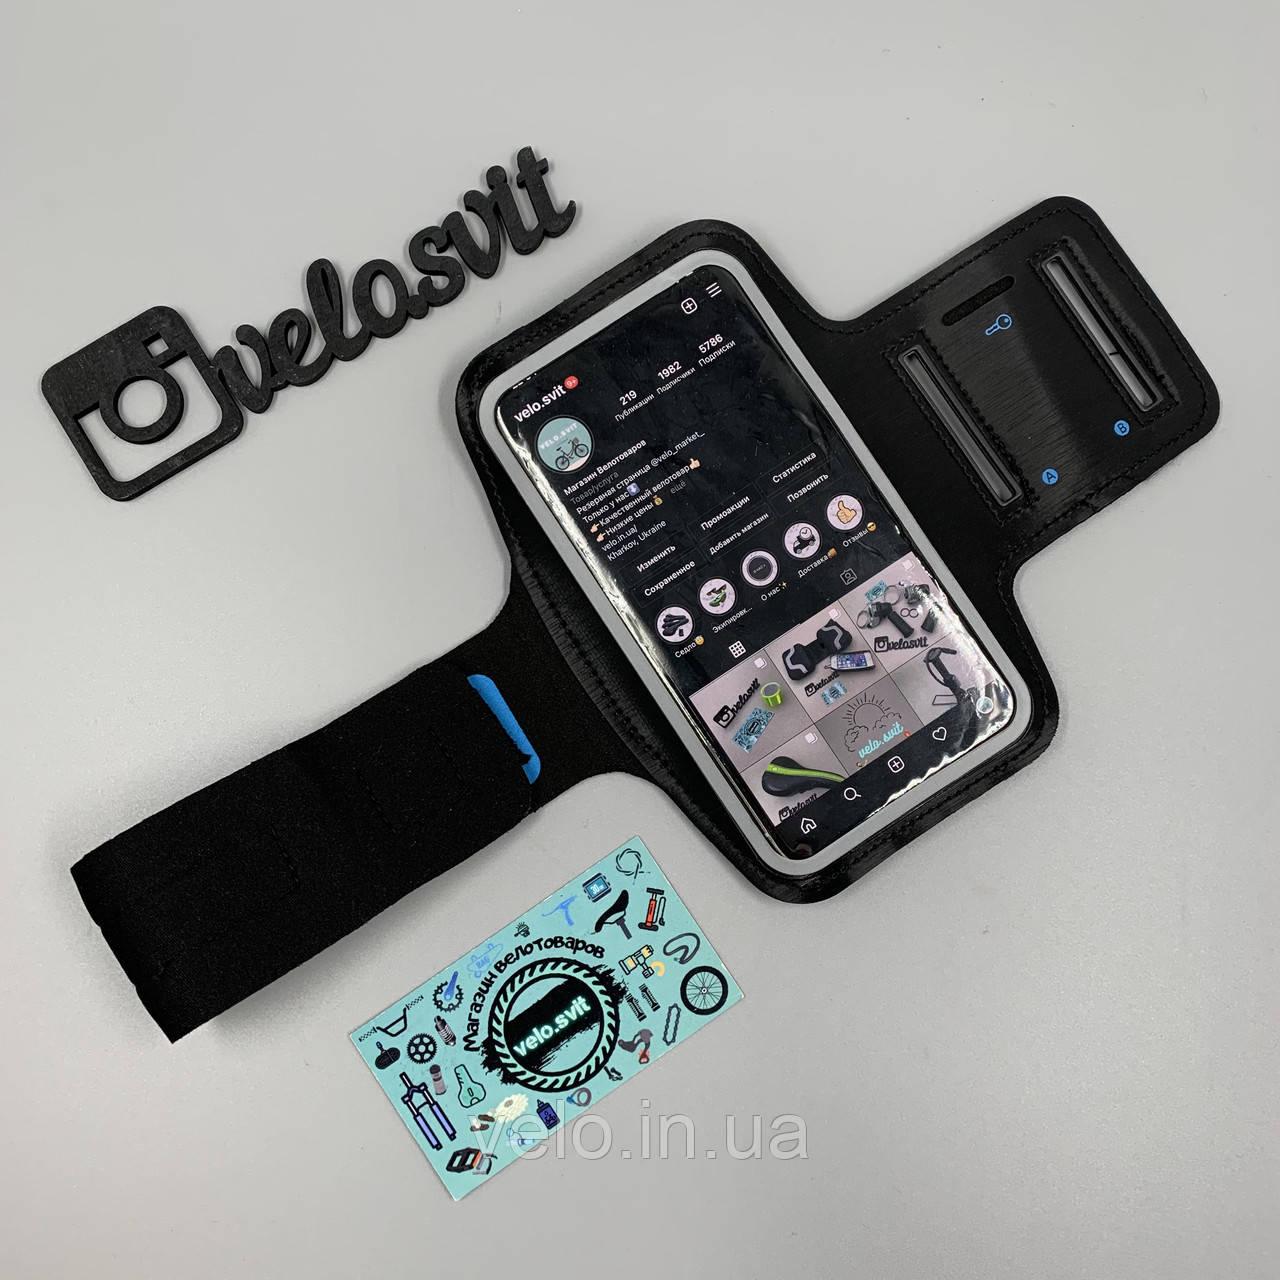 Спортивная сумка на руку под телефон